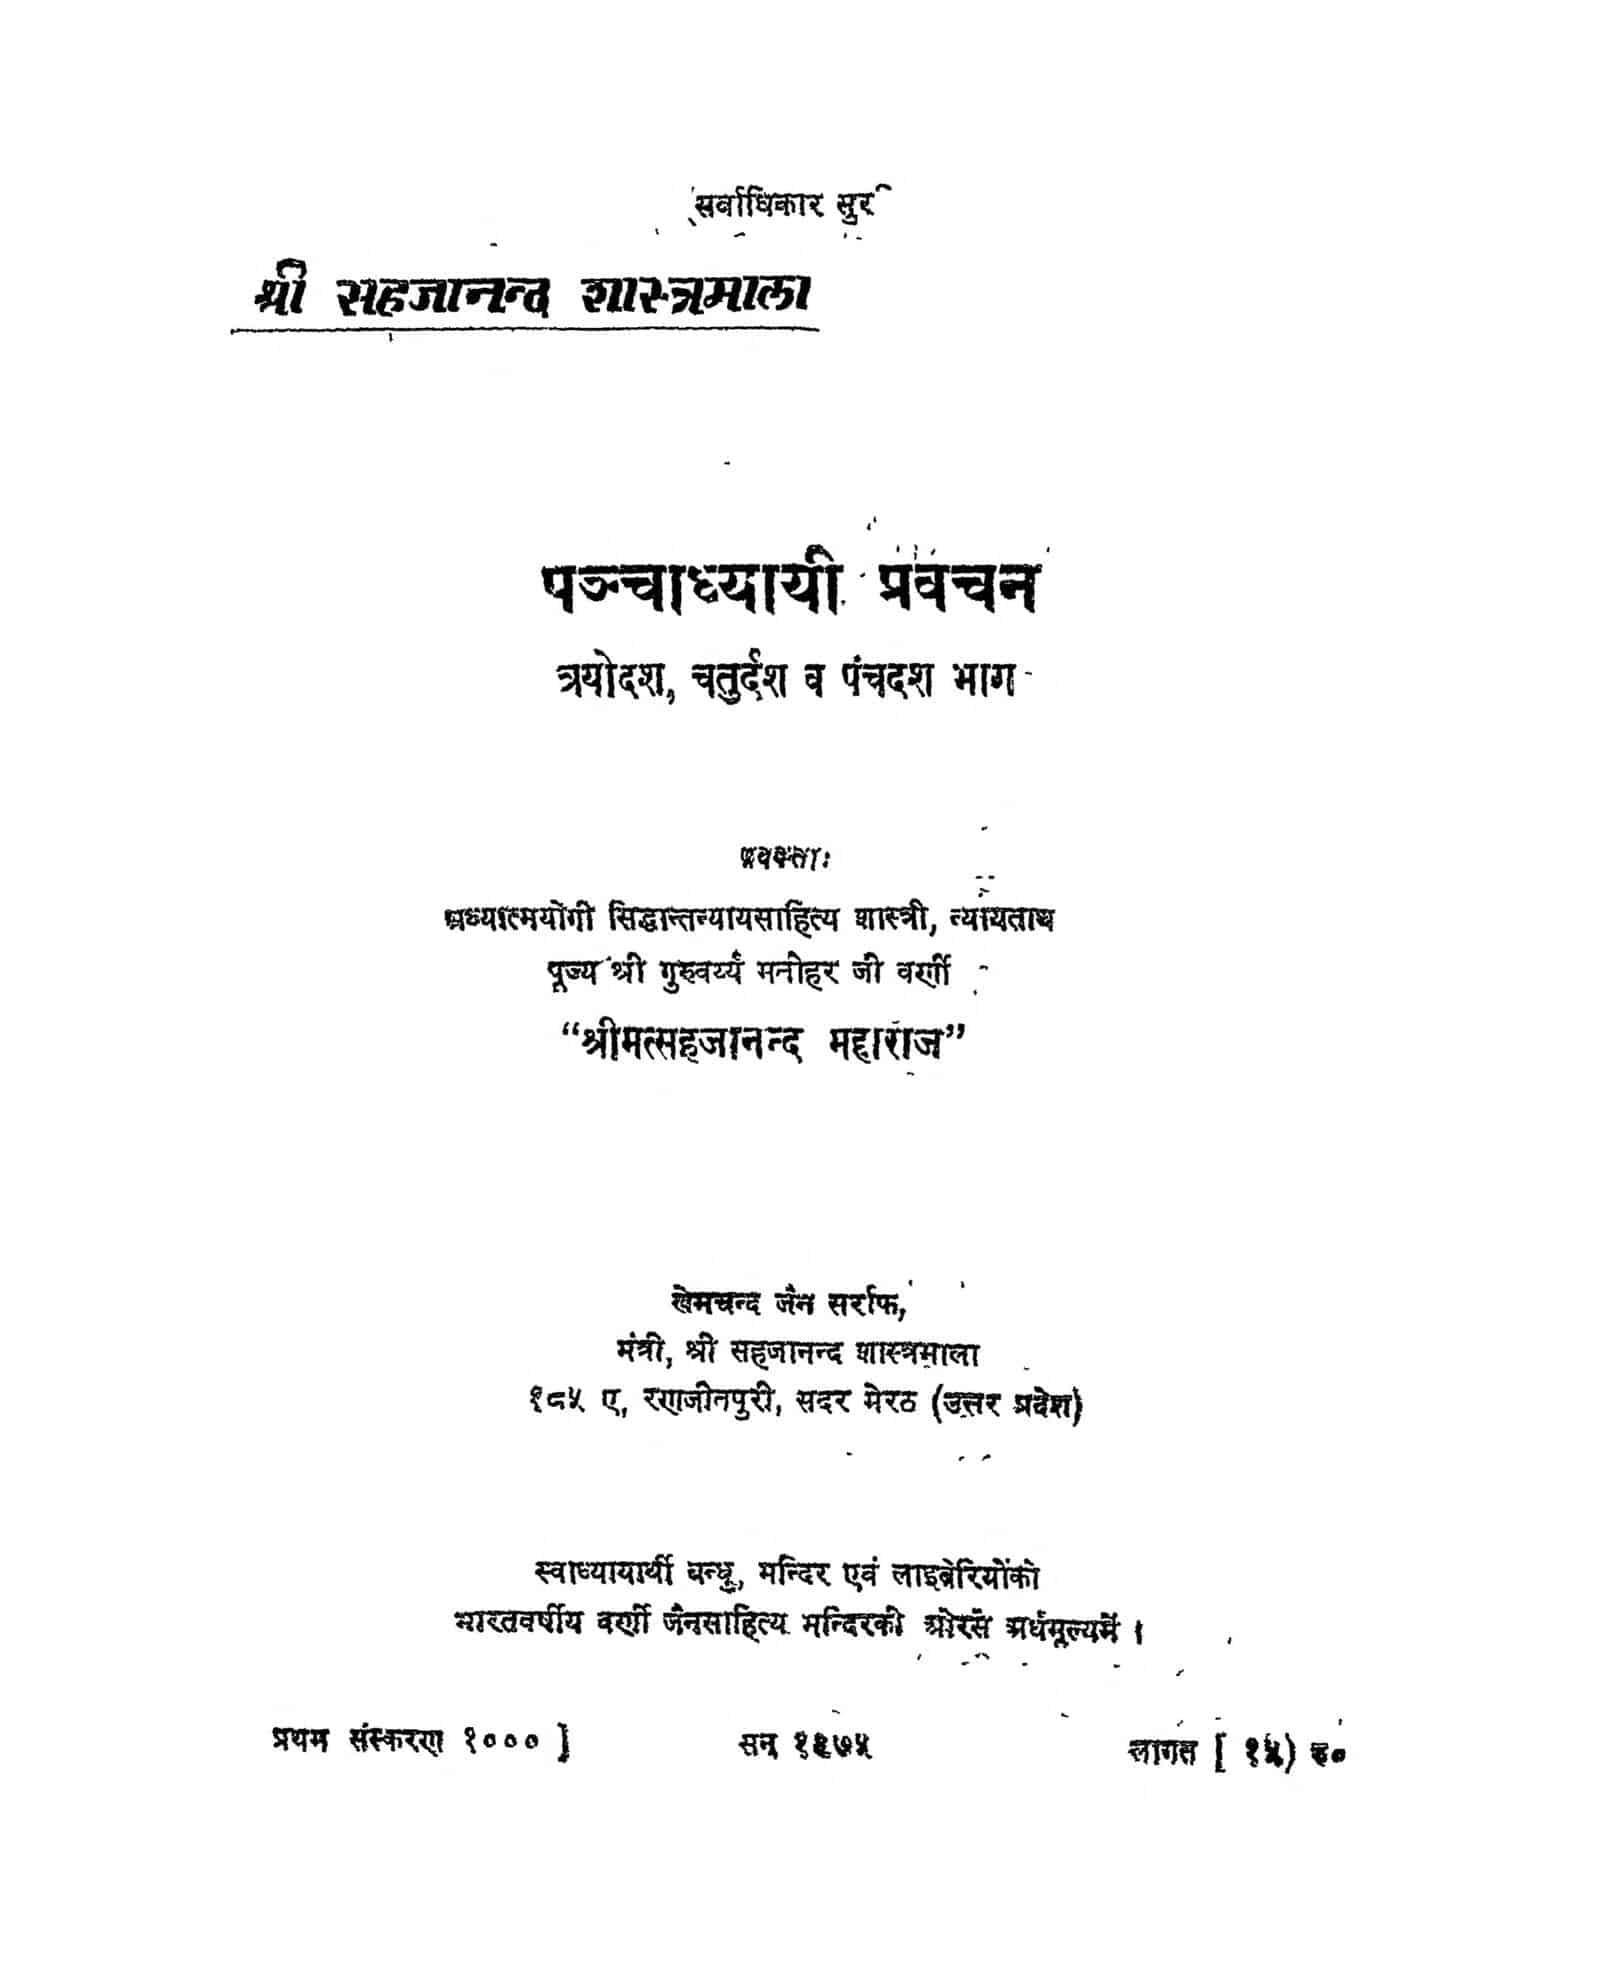 Book Image : पंचाध्यायी प्रवचन त्रयोदश , चतुर्दश व पंचदश भाग - Panchadhyayi Pravachan